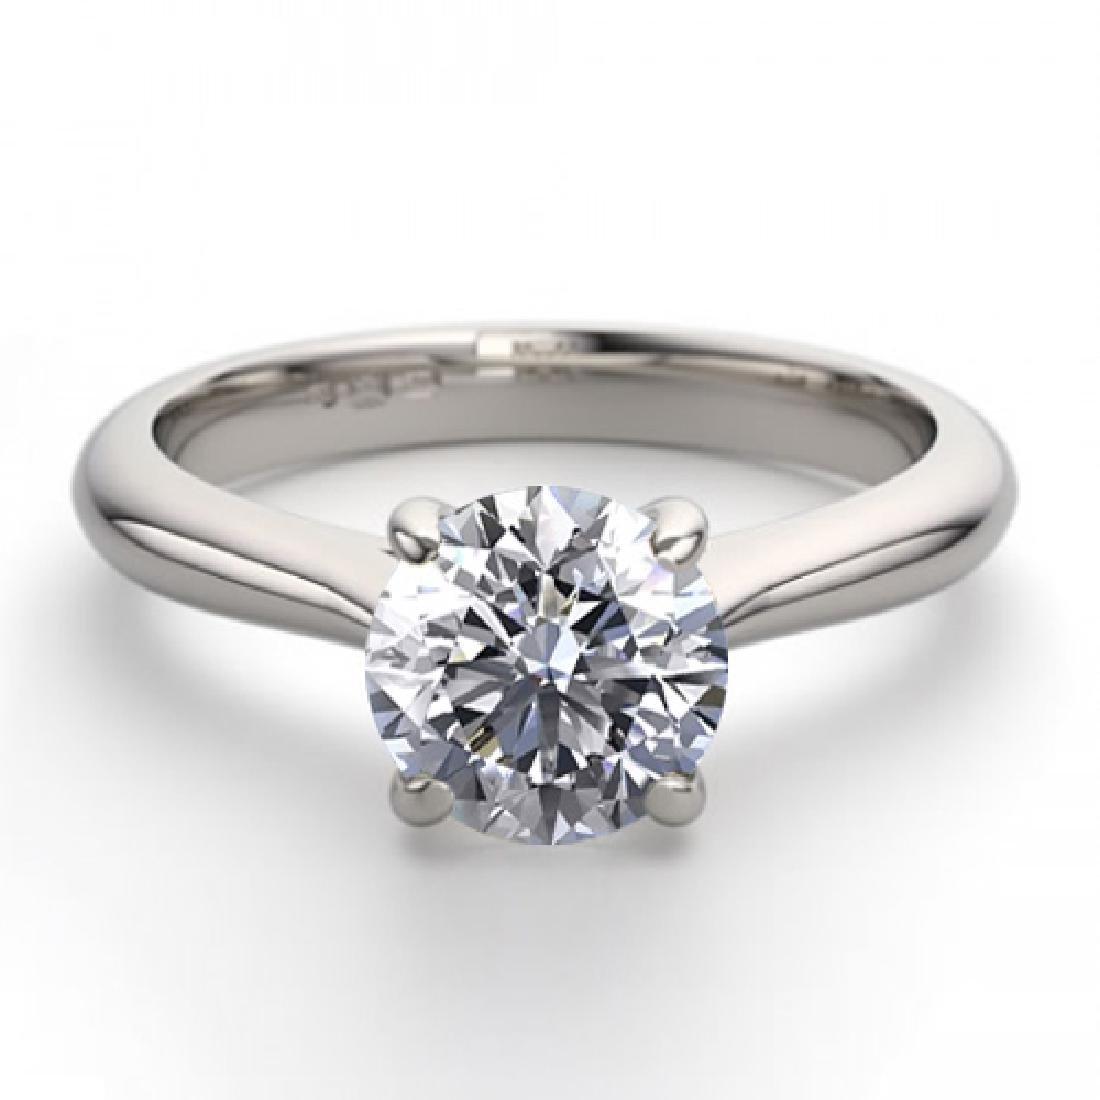 14K White Gold Jewelry 1.36 ctw Natural Diamond